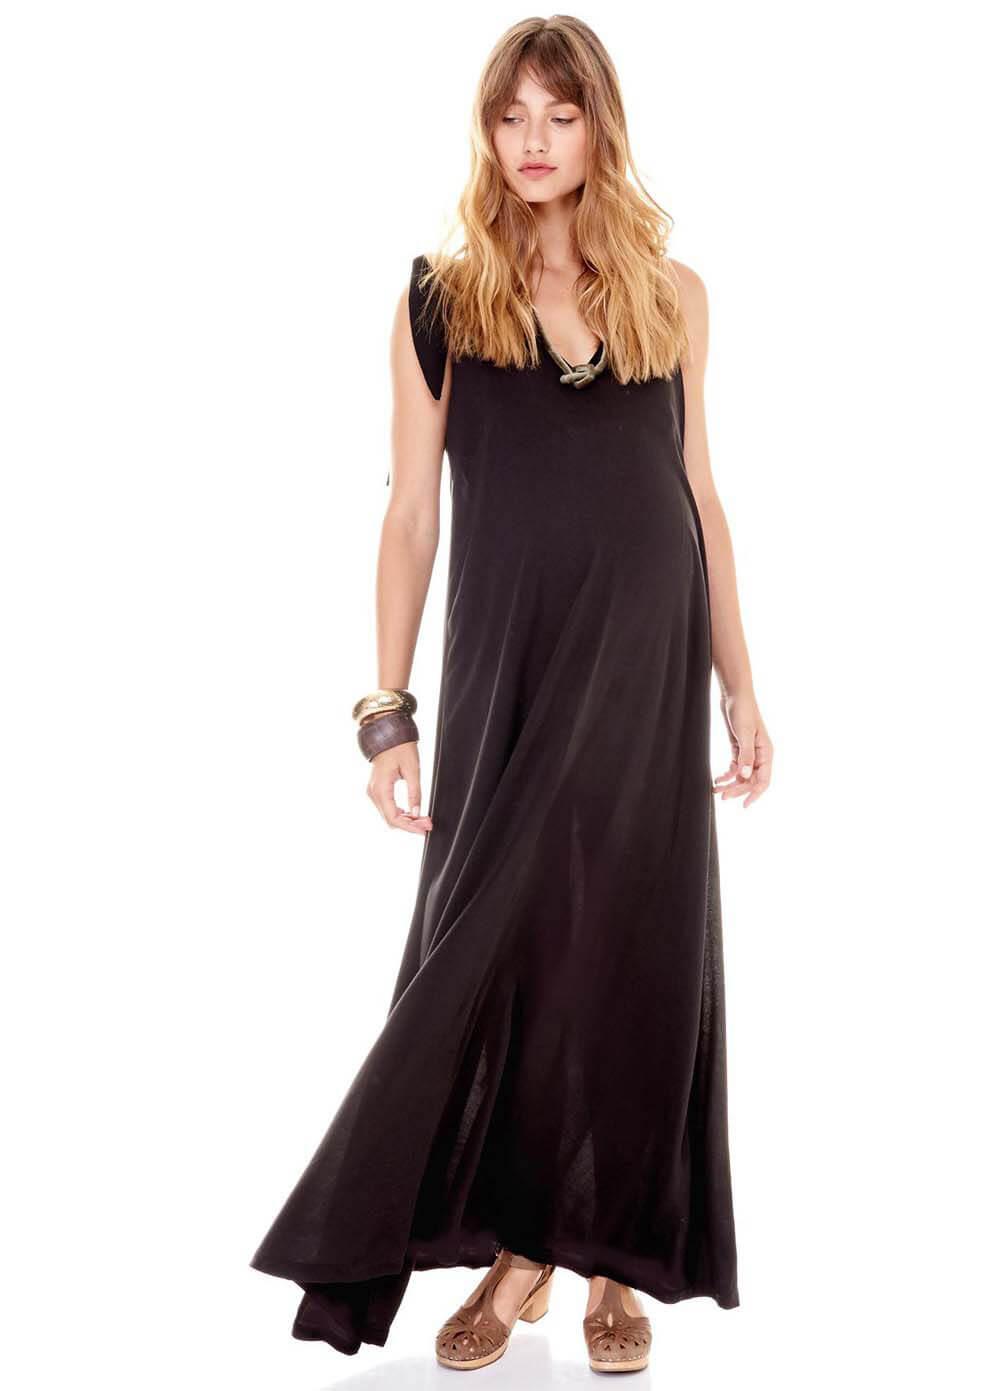 7f88024fd621 Jordan Maternity Maxi Dress in Black by Imanimo